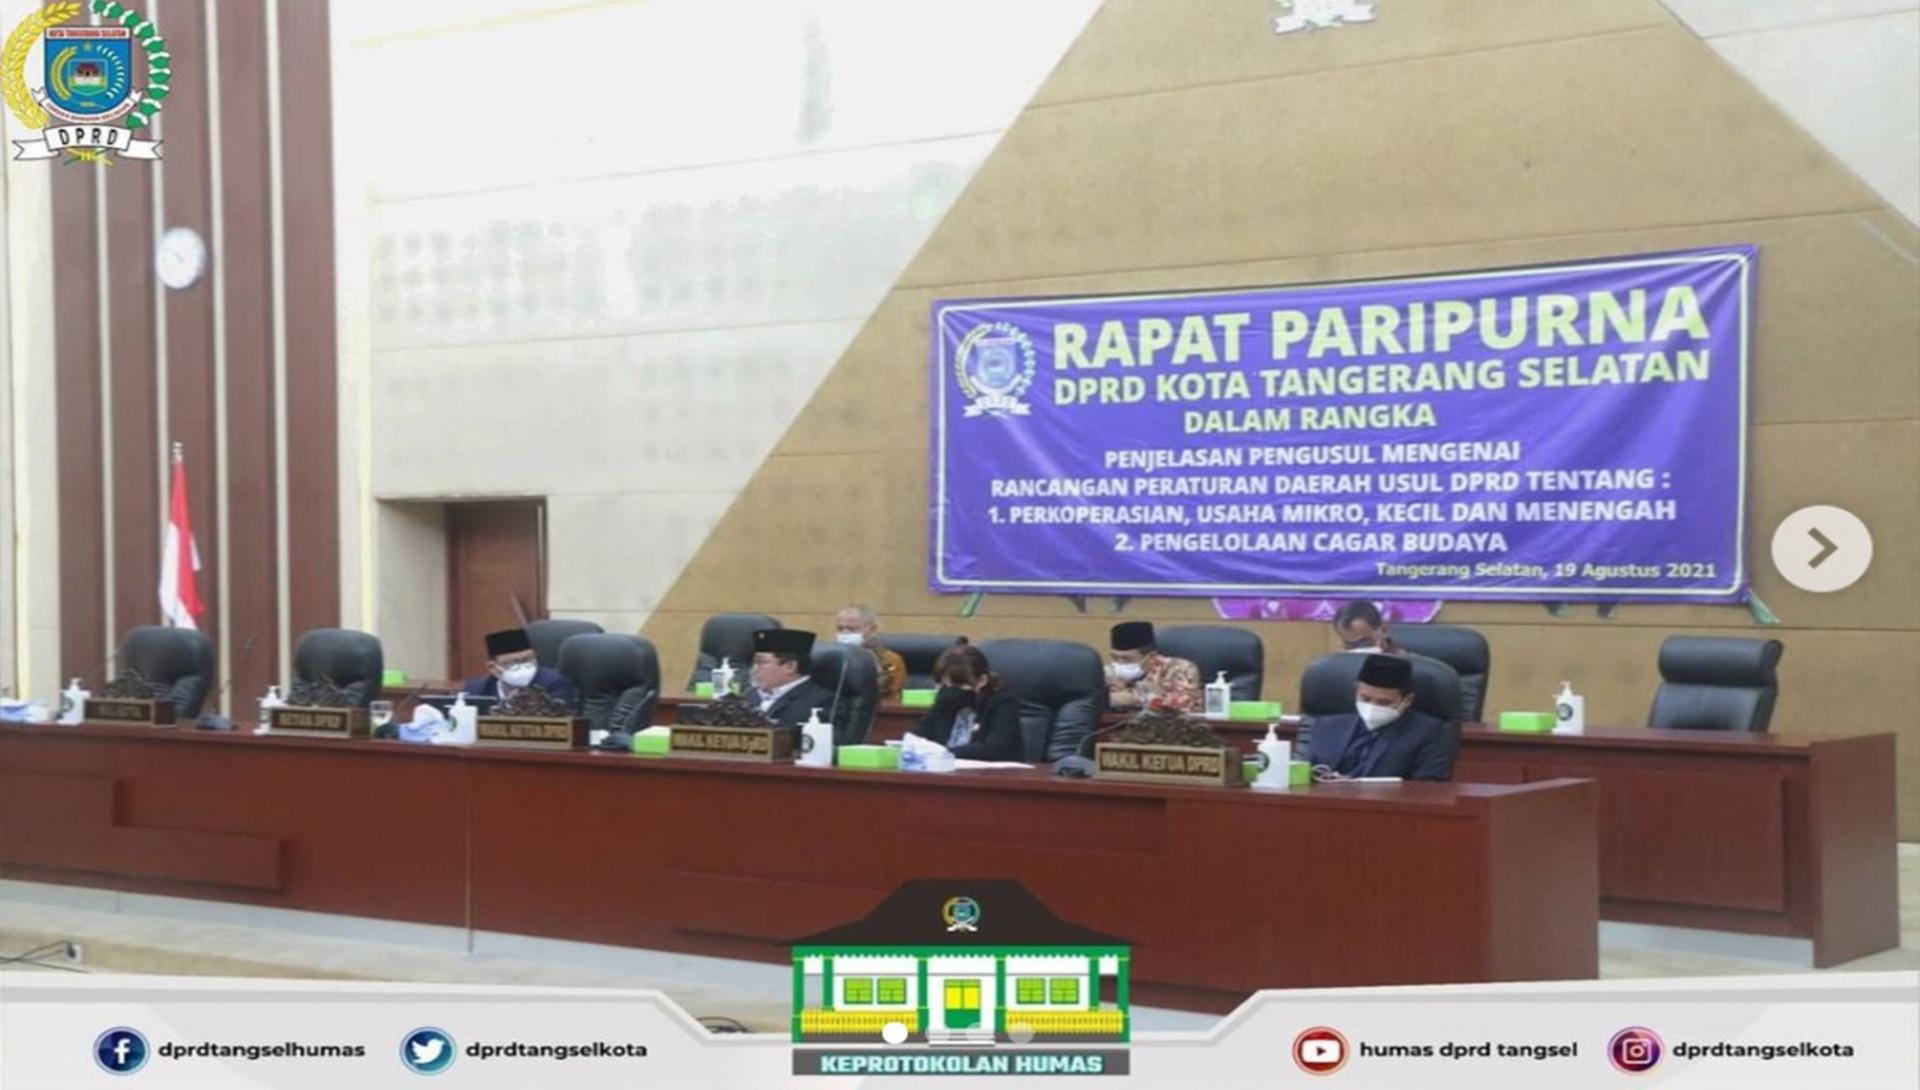 DPRD Tangsel menggelar 2 agenda Rapat Paripurna